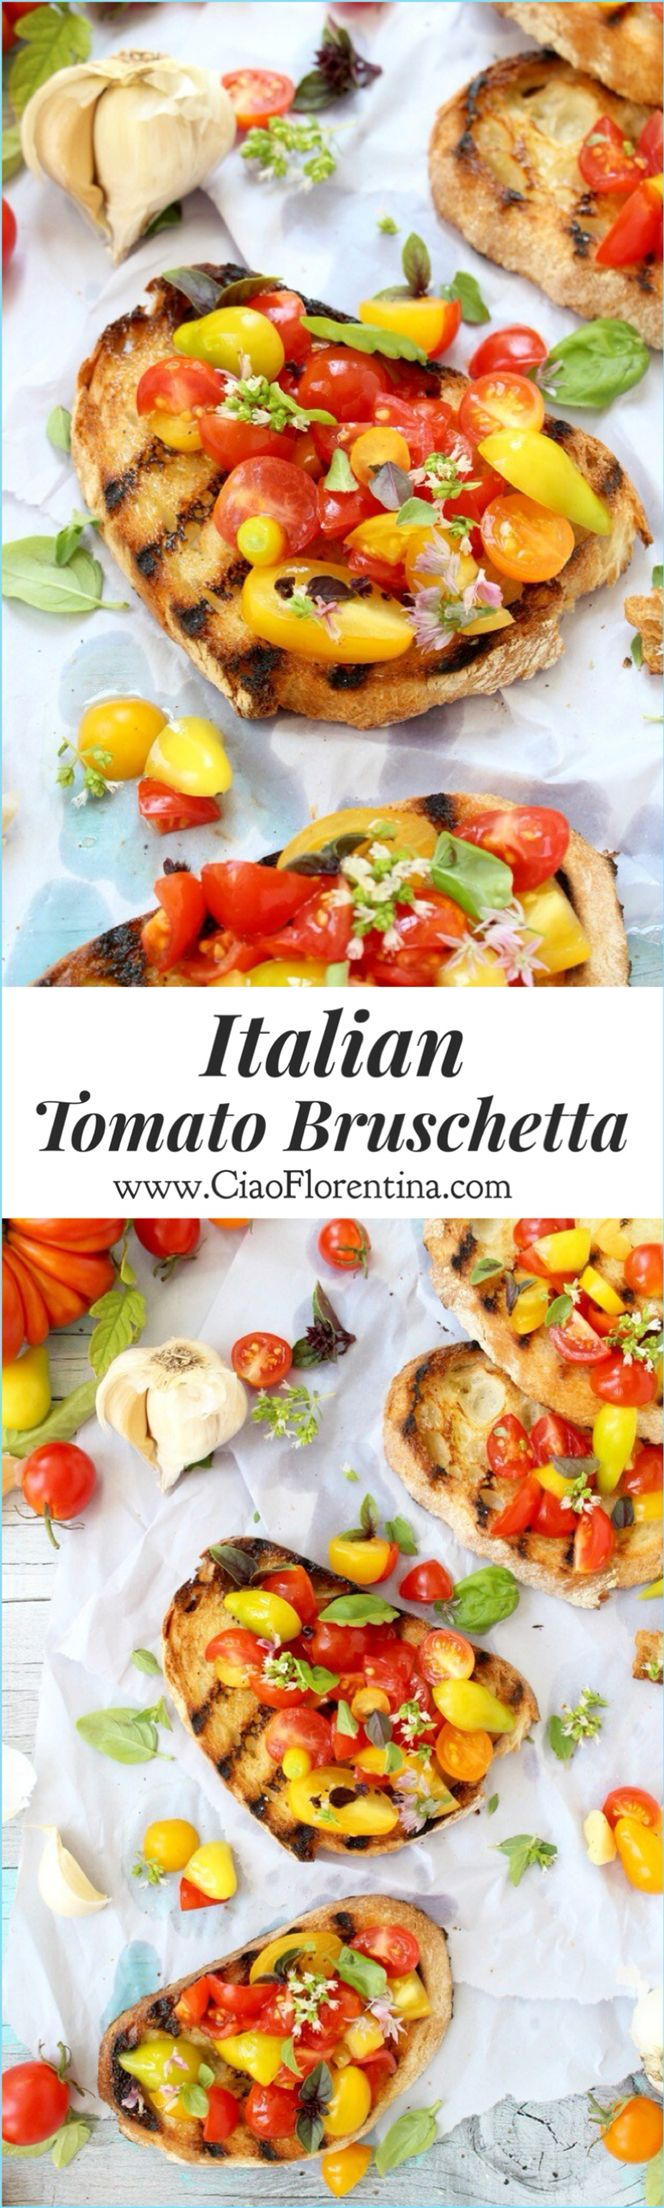 Tomato Bruschetta Recipe ( Italian Bruschetta ) | CiaoFlorentina.com @CiaoFlorentina